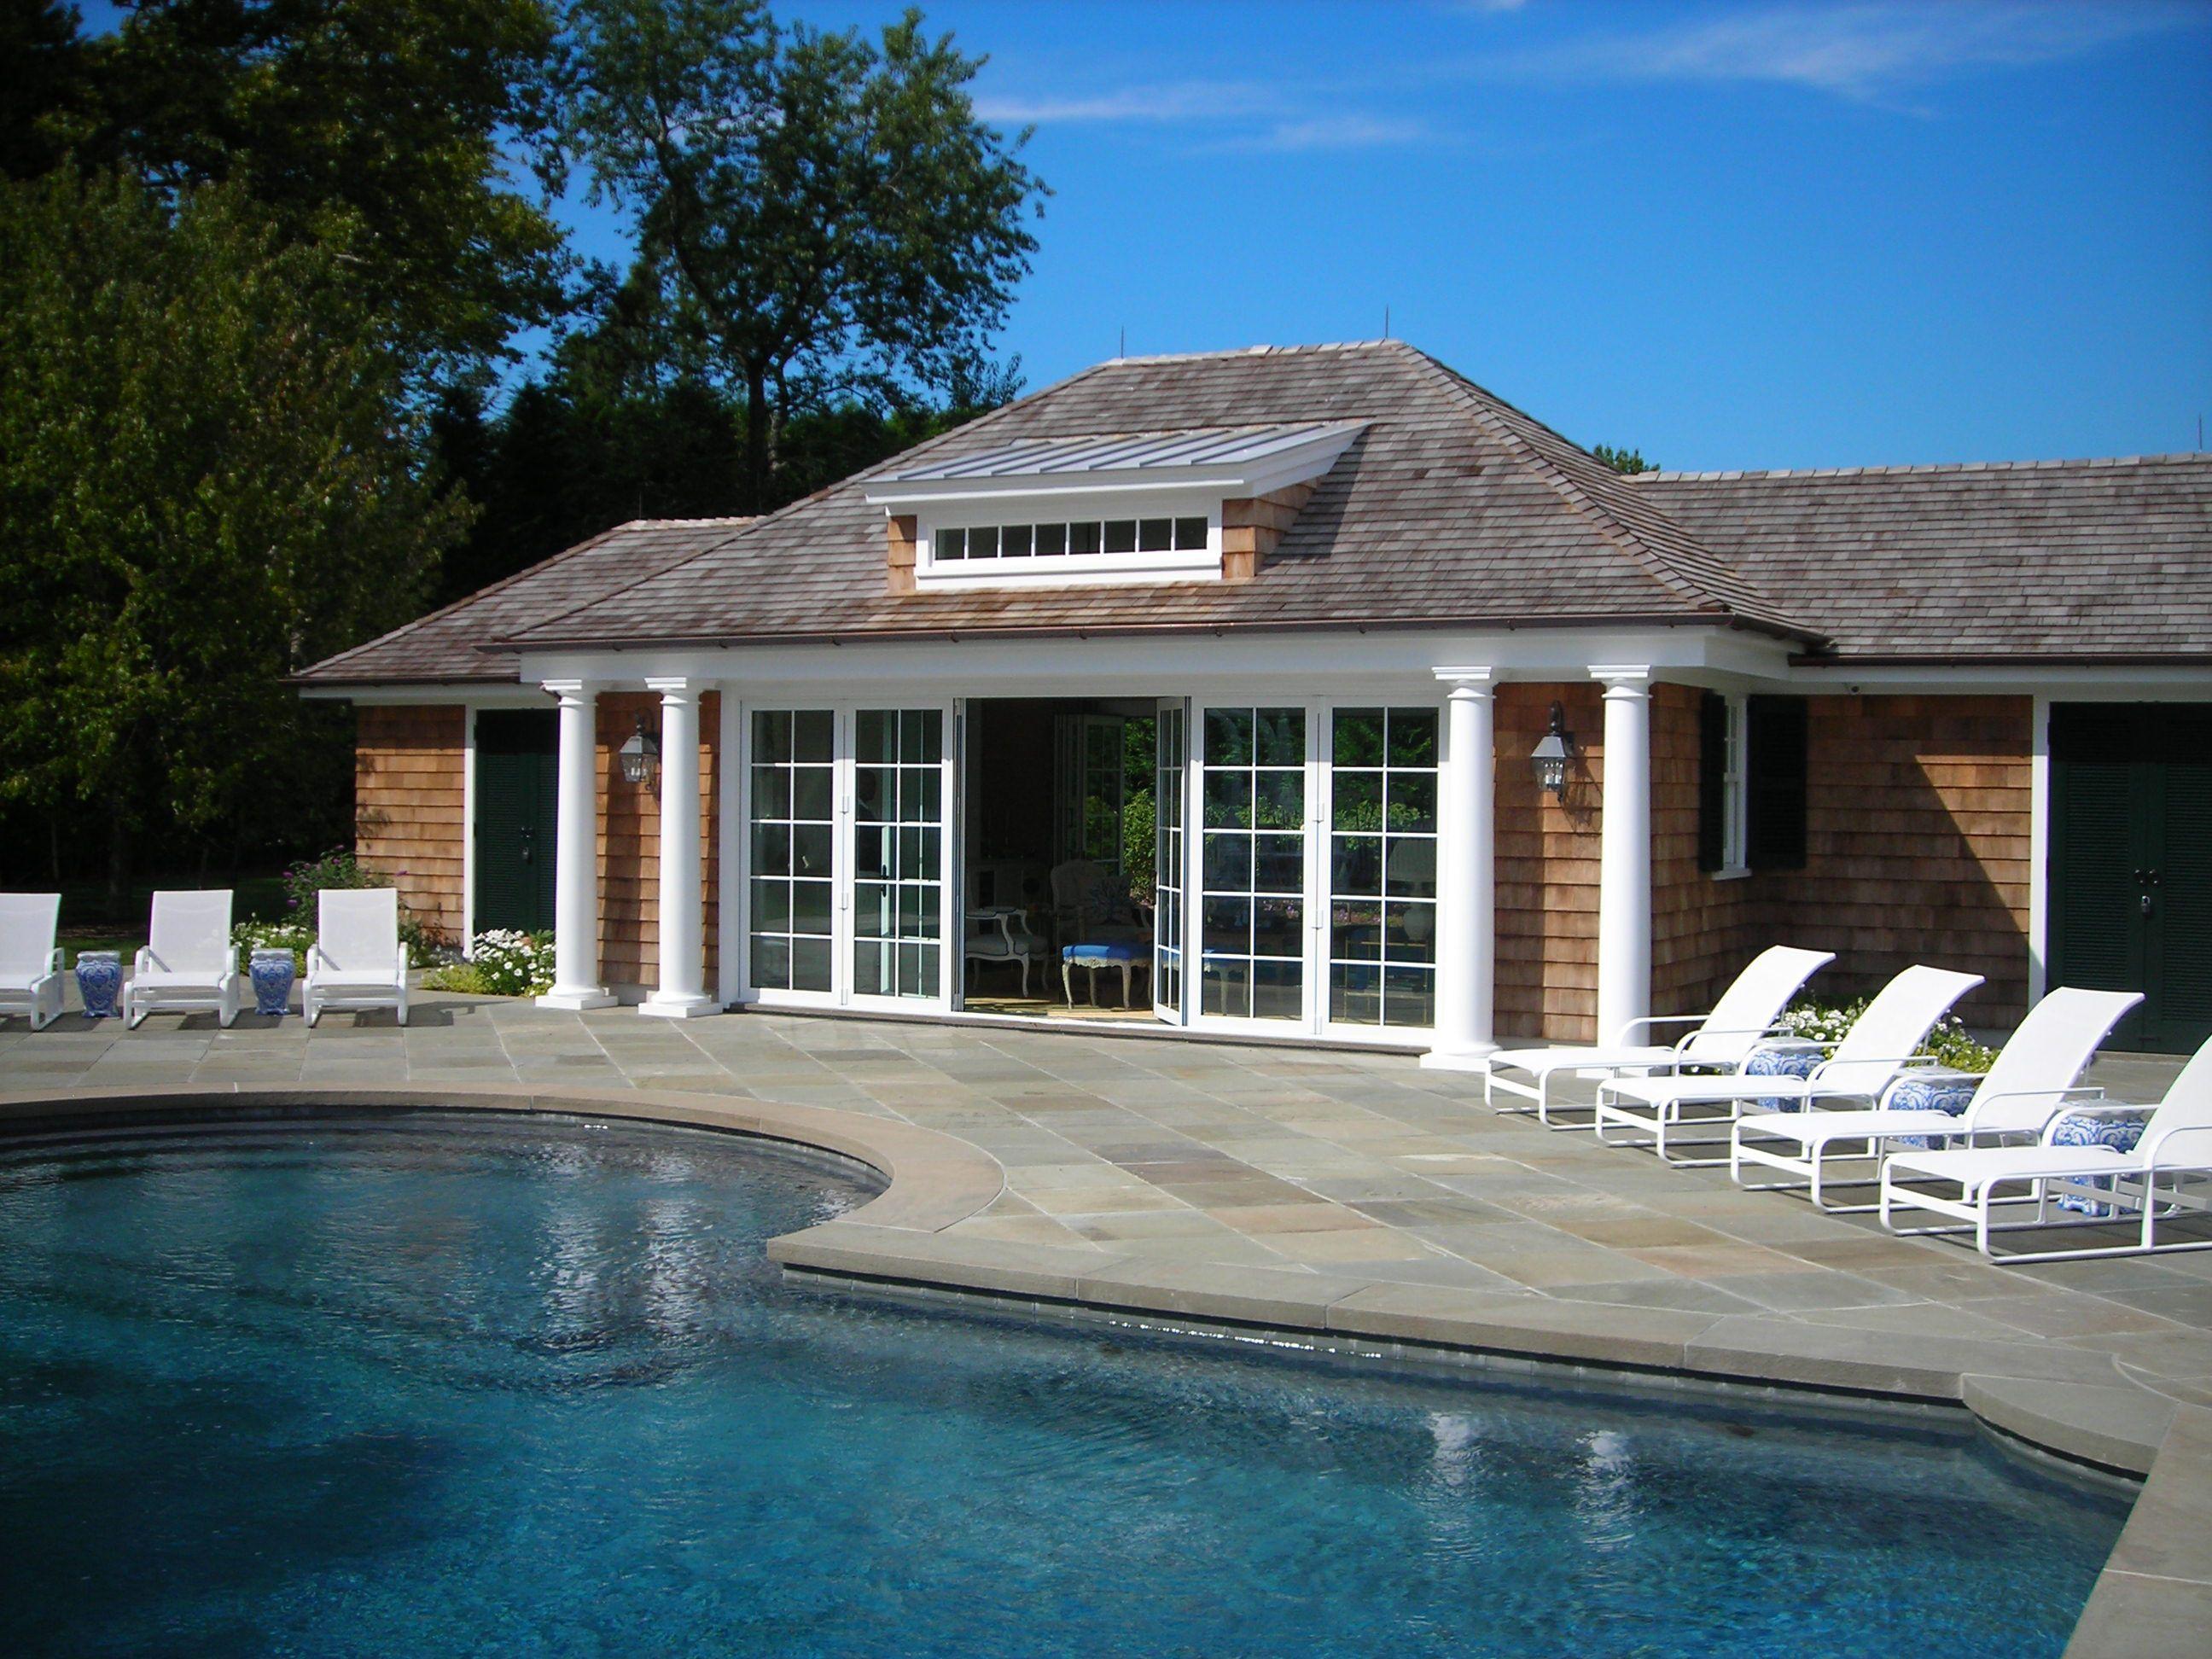 Pool Houses Pool Cabanas Solar Innovations Pool House